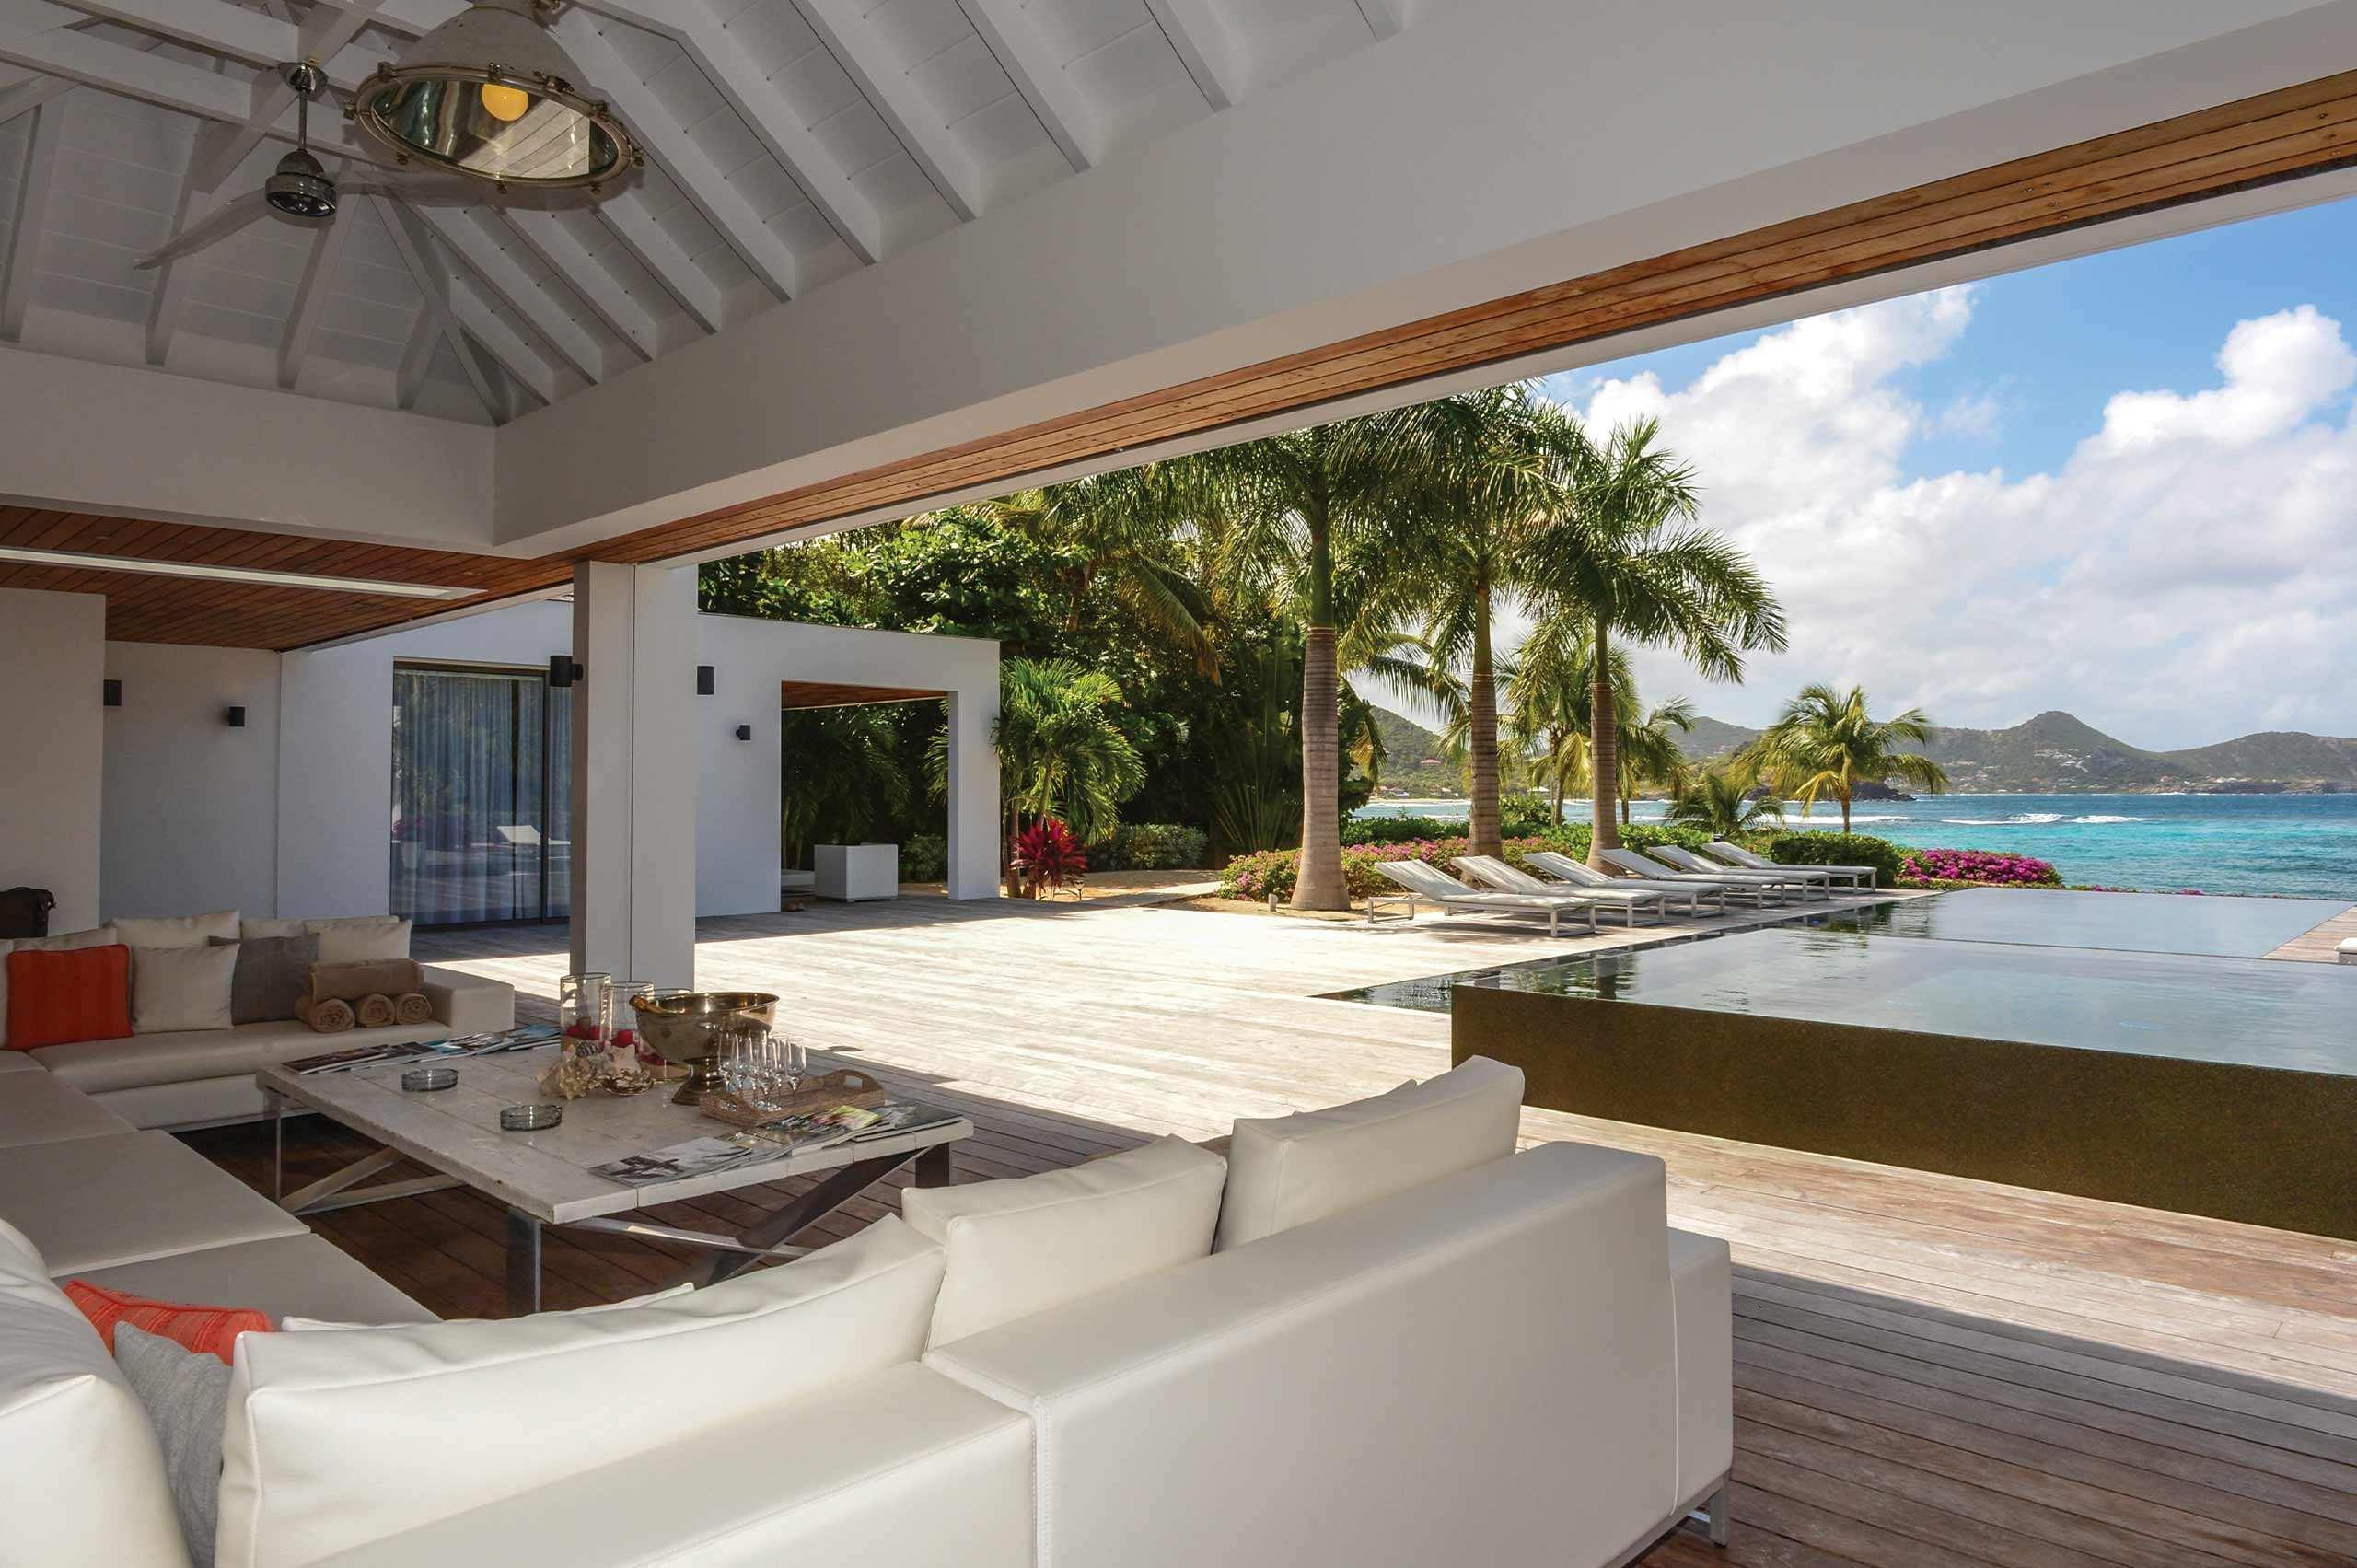 St Barts villa rentals by owner